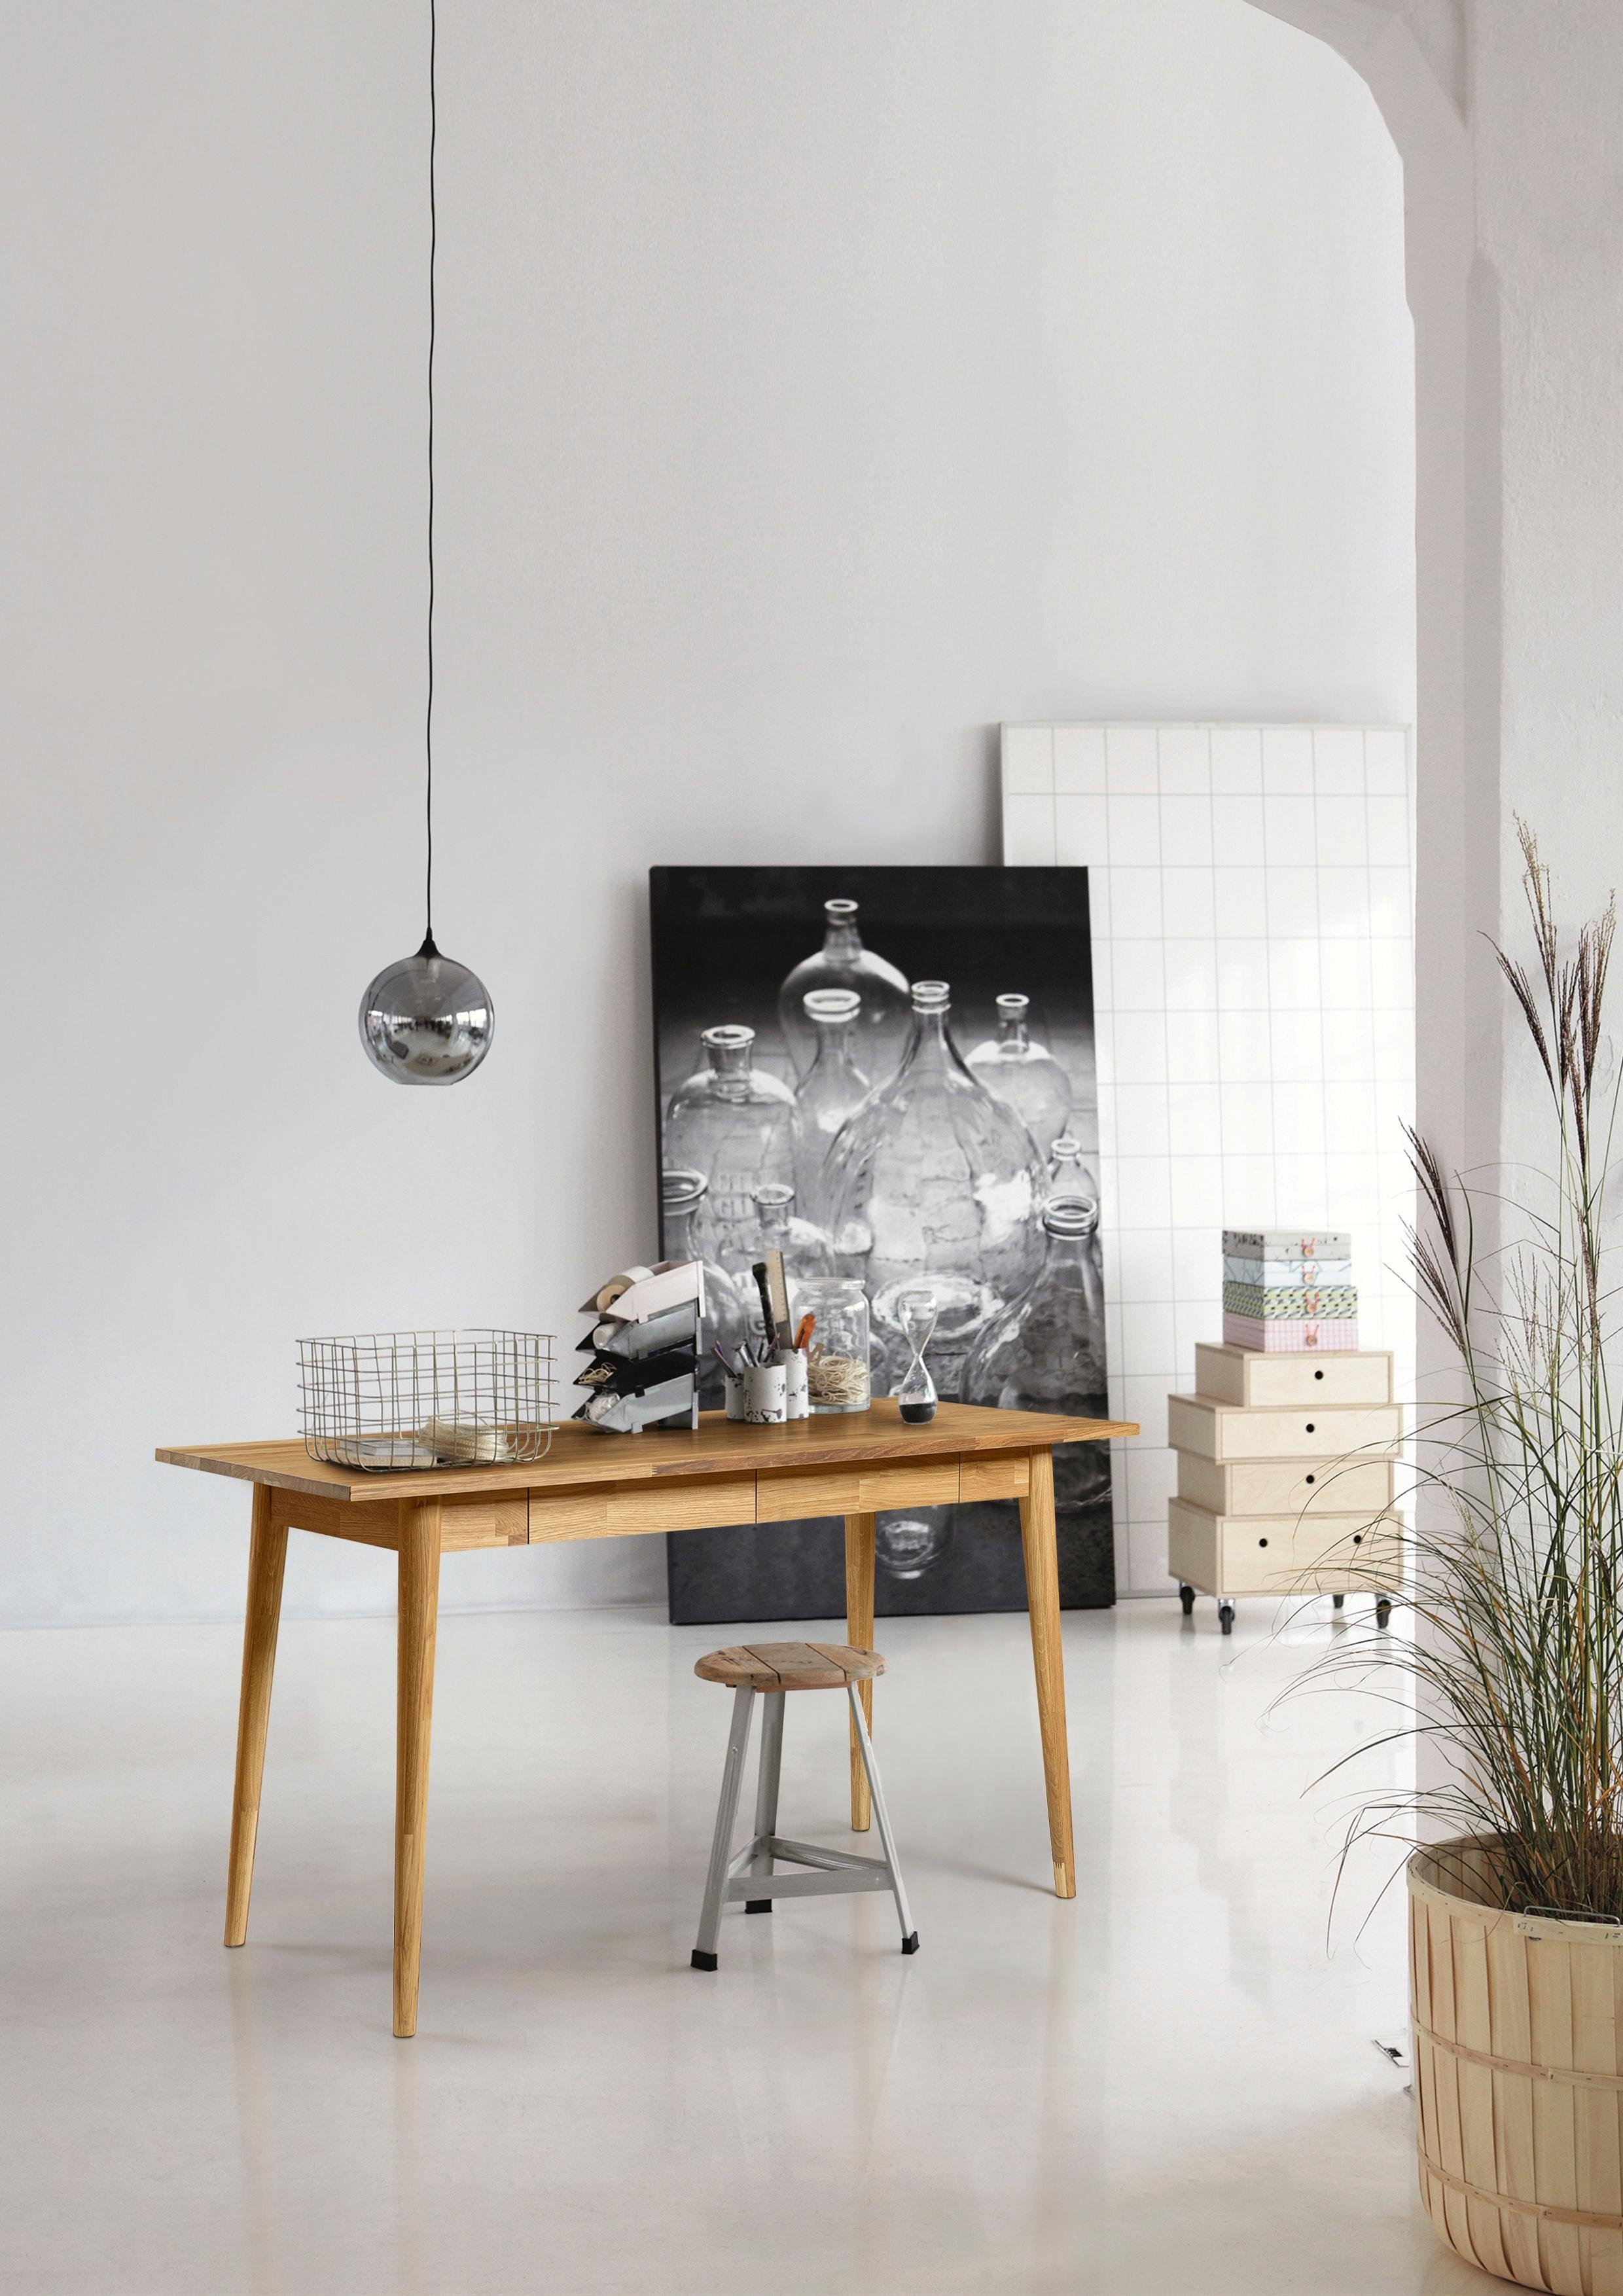 Home affaire Bureau Scandi van mooi massief eikenhout, breedte 140 cm goedkoop op otto.nl kopen